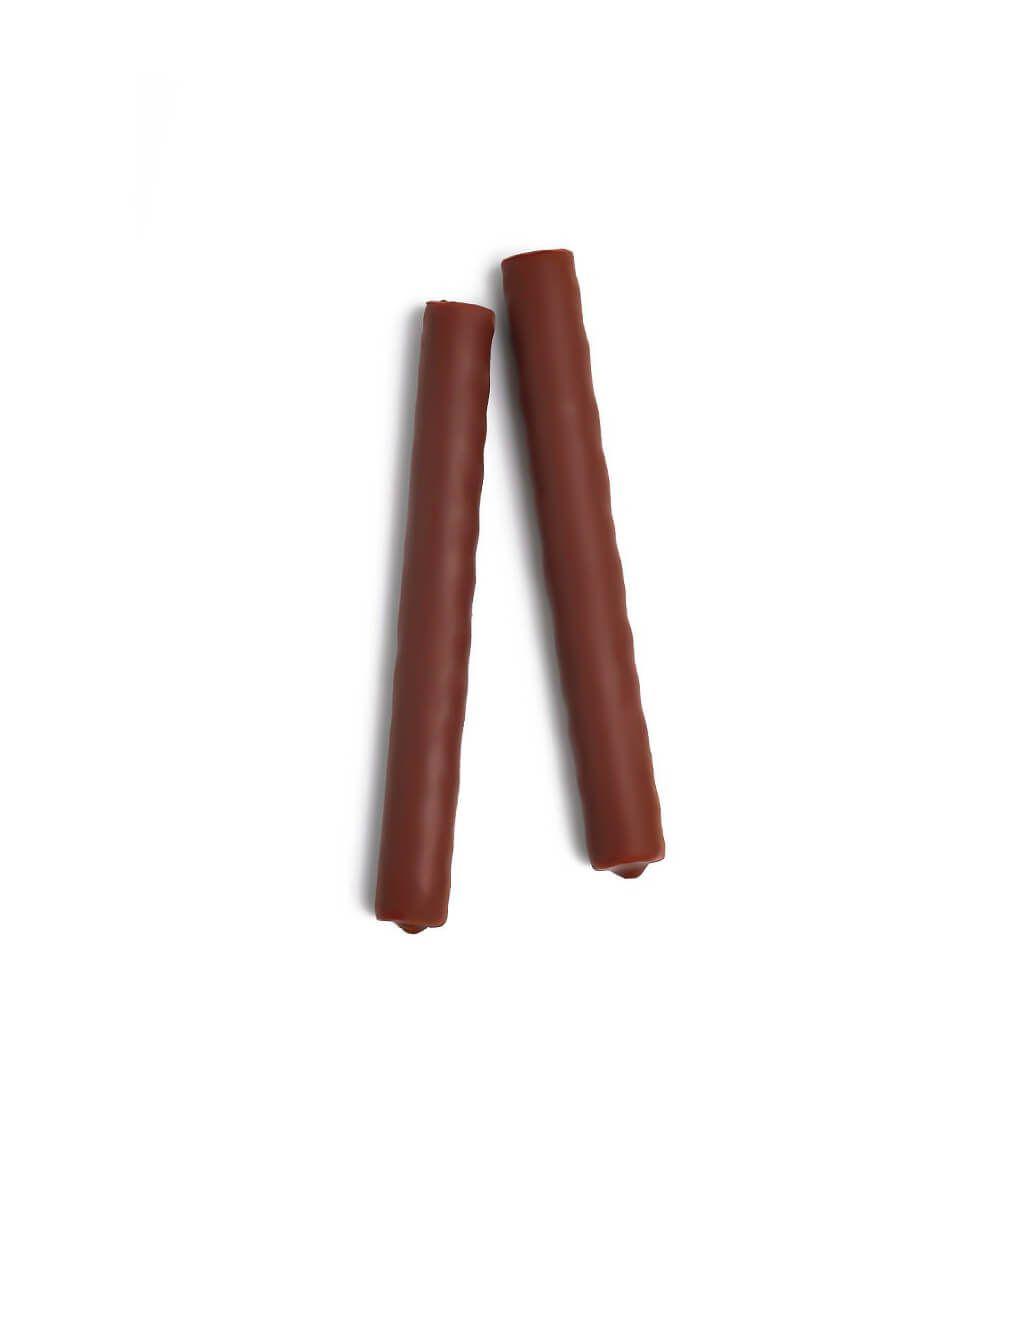 Garrotazos Choco estuche 825 g